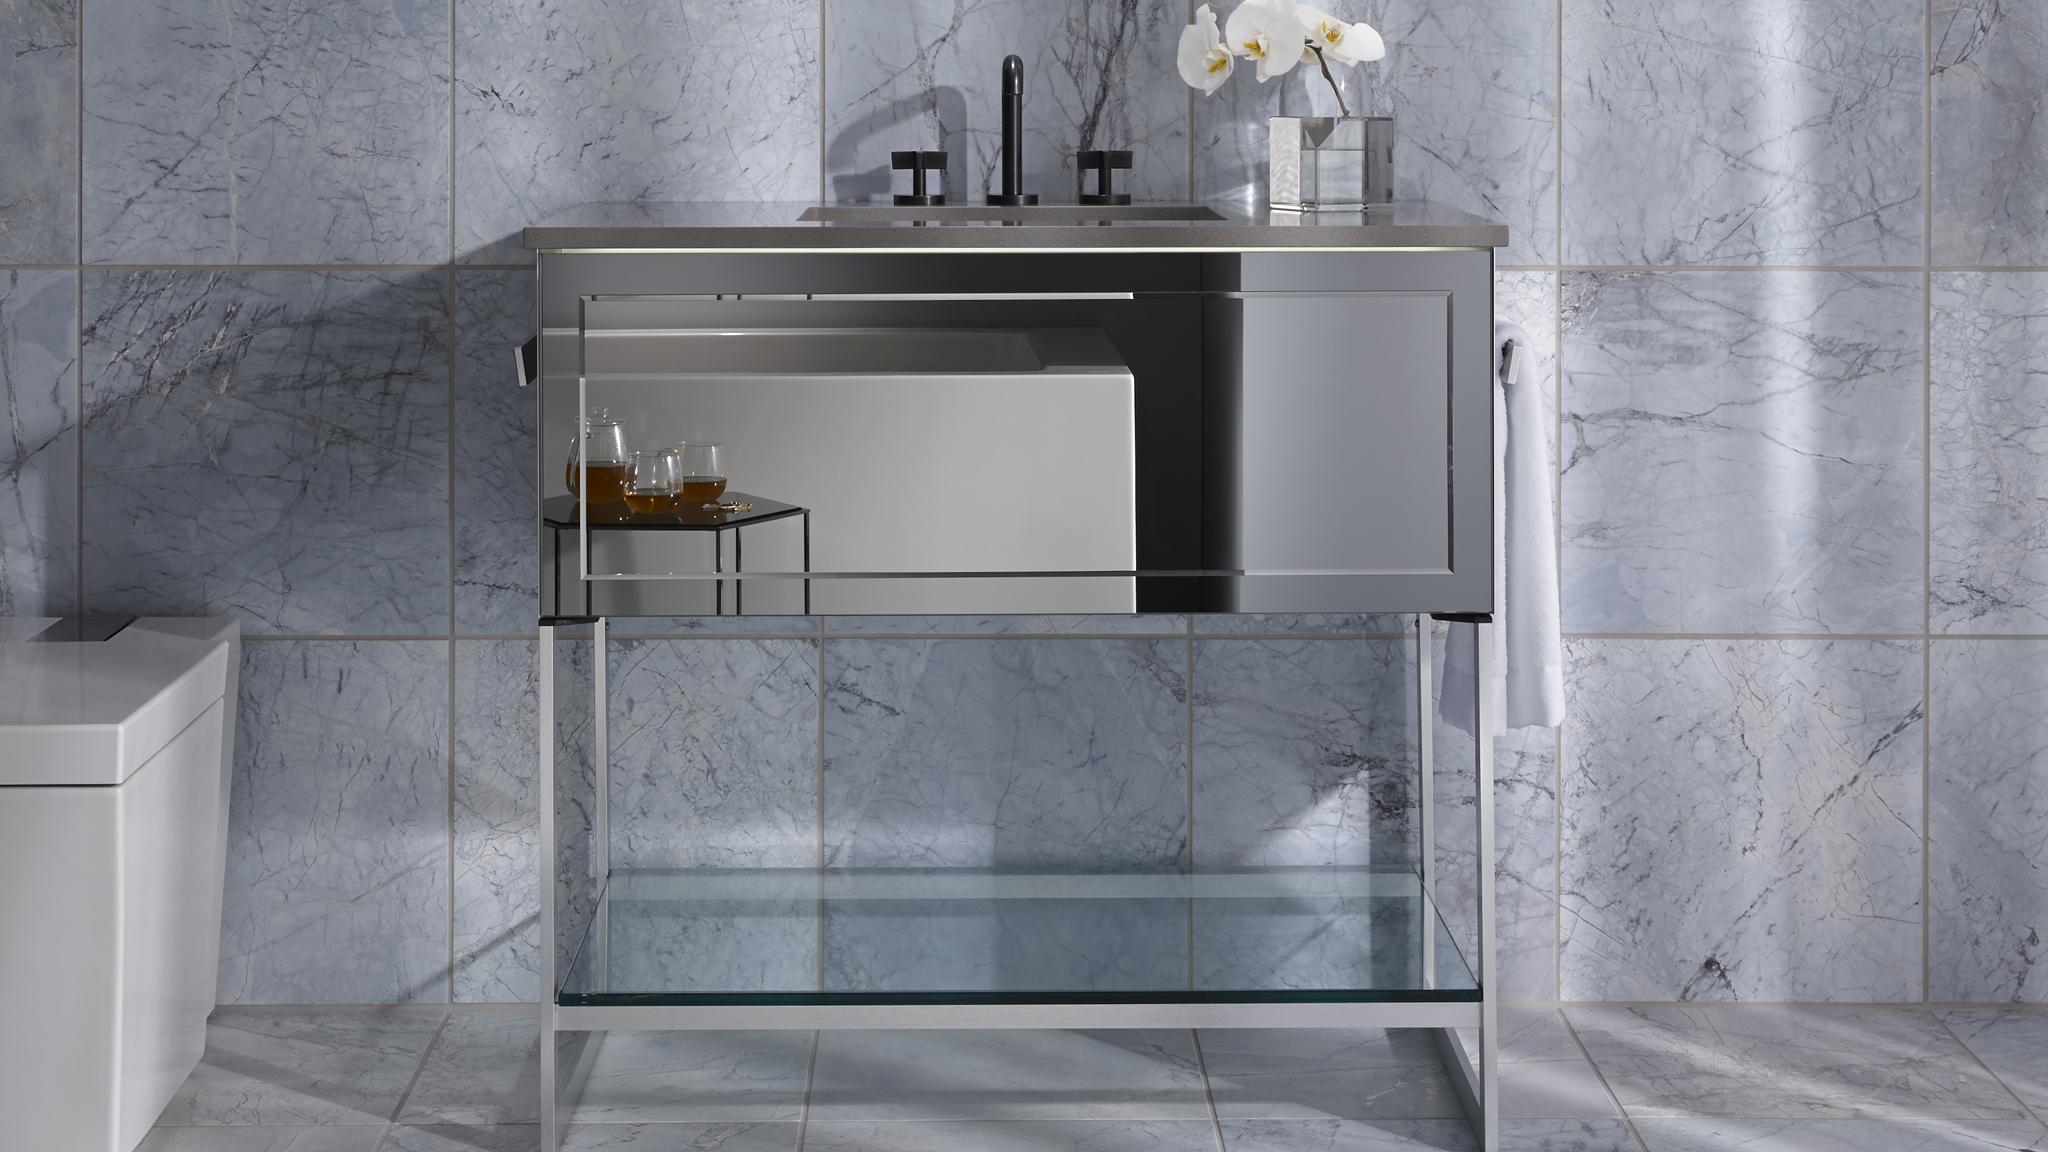 design glass vanities cartesian robern wall mount single drawer bathroom products modular with vanity